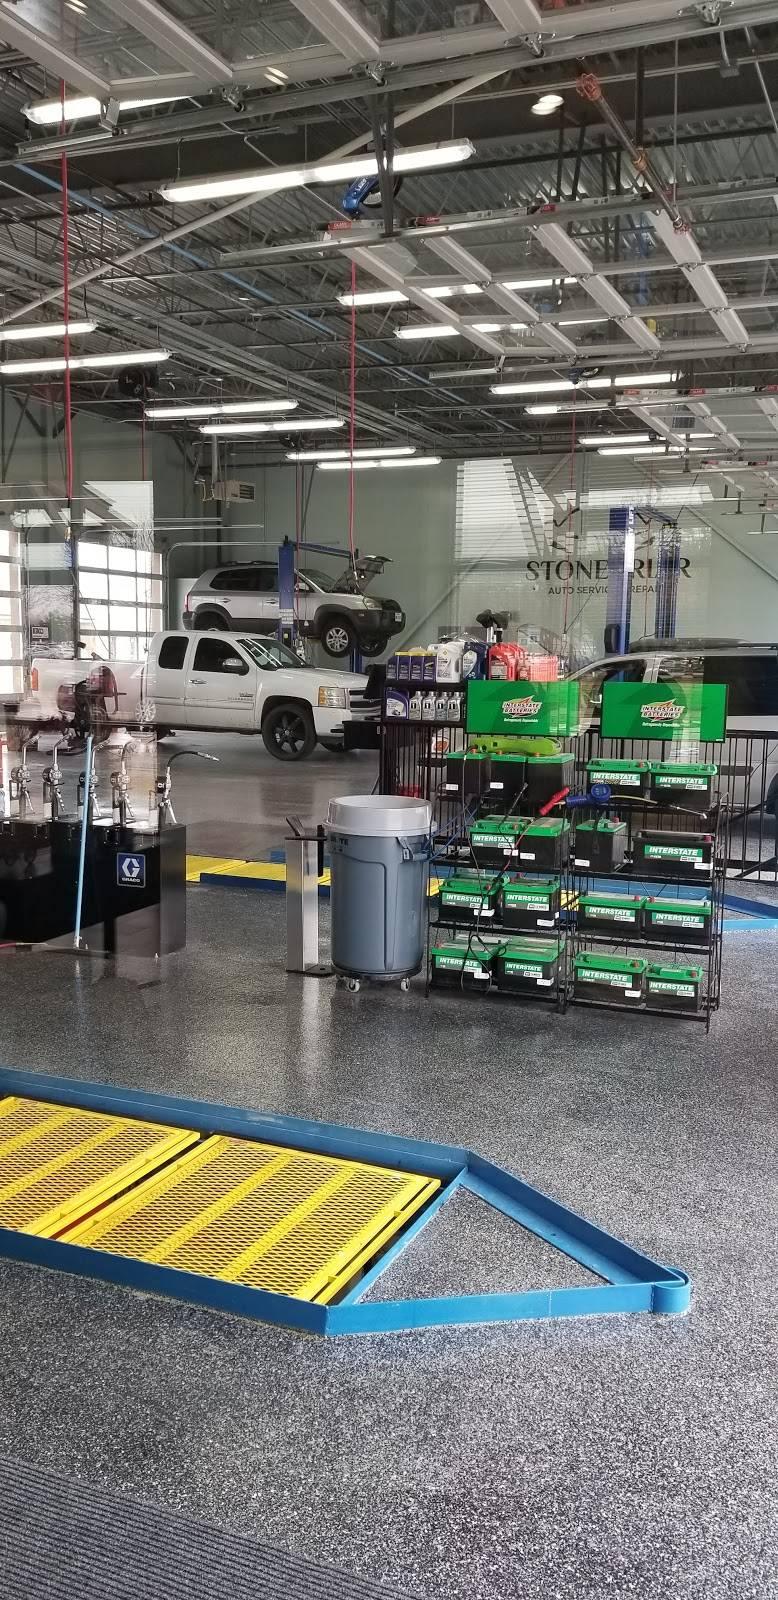 Stonebriar Auto Service & Repair, LLC - car repair  | Photo 8 of 10 | Address: 12600 Lebanon Rd, Frisco, TX 75035, USA | Phone: (469) 200-8406